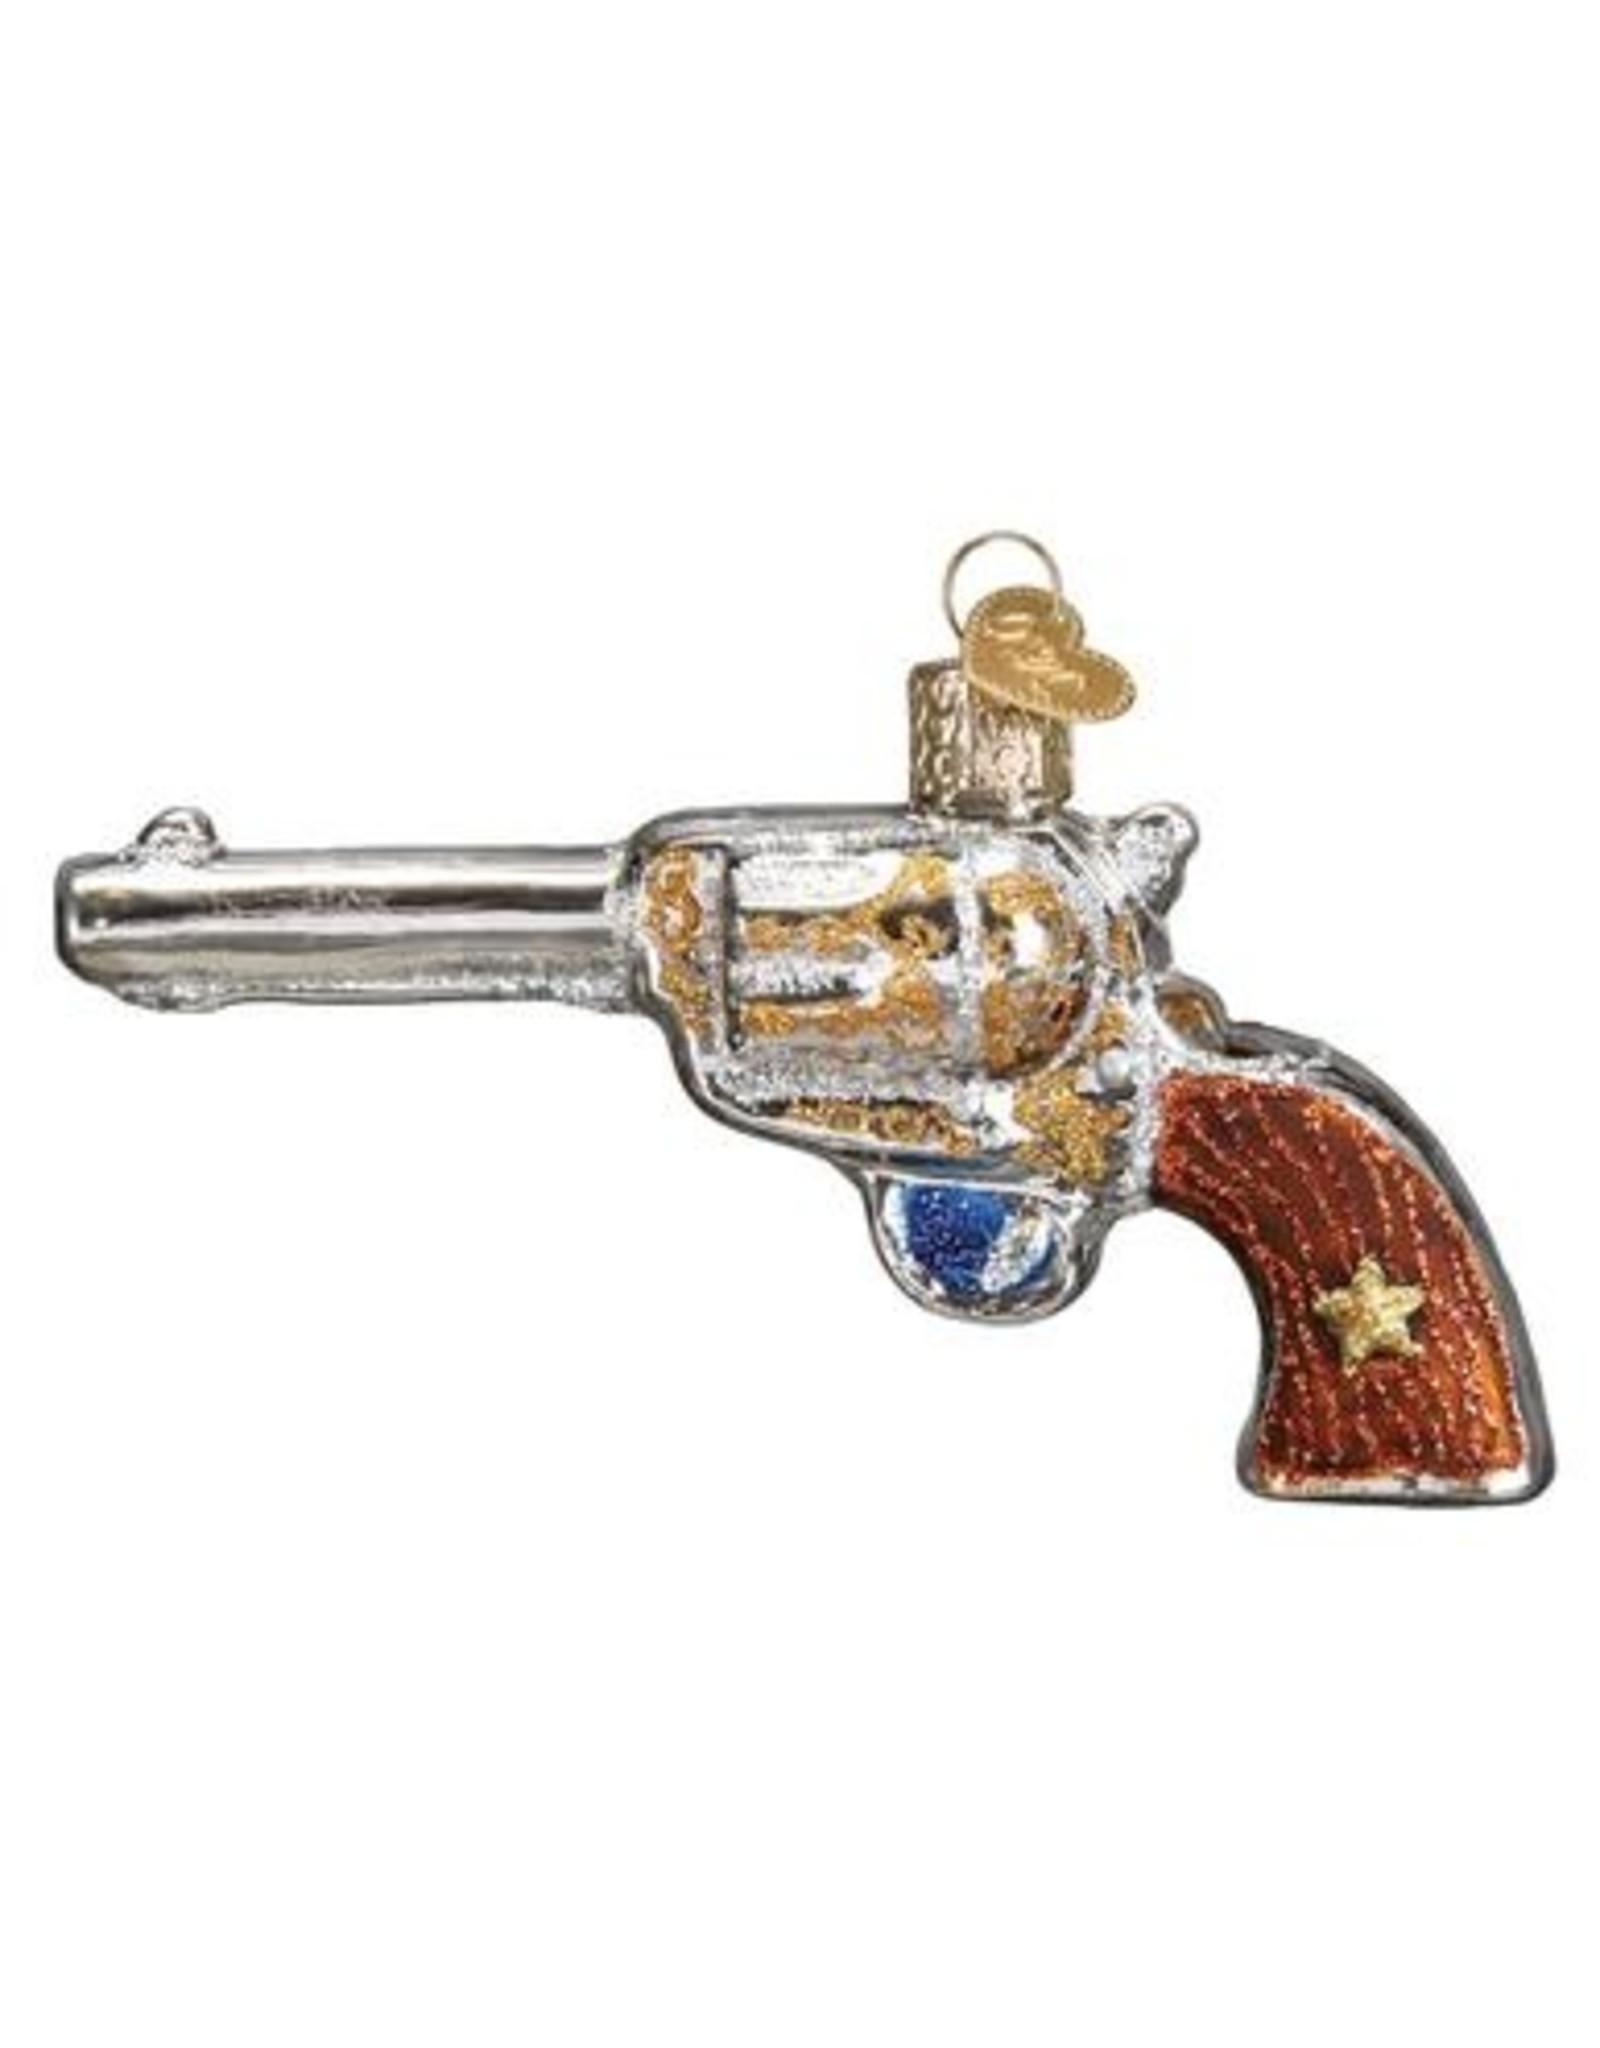 Old World Christmas Western Revolver Ornament